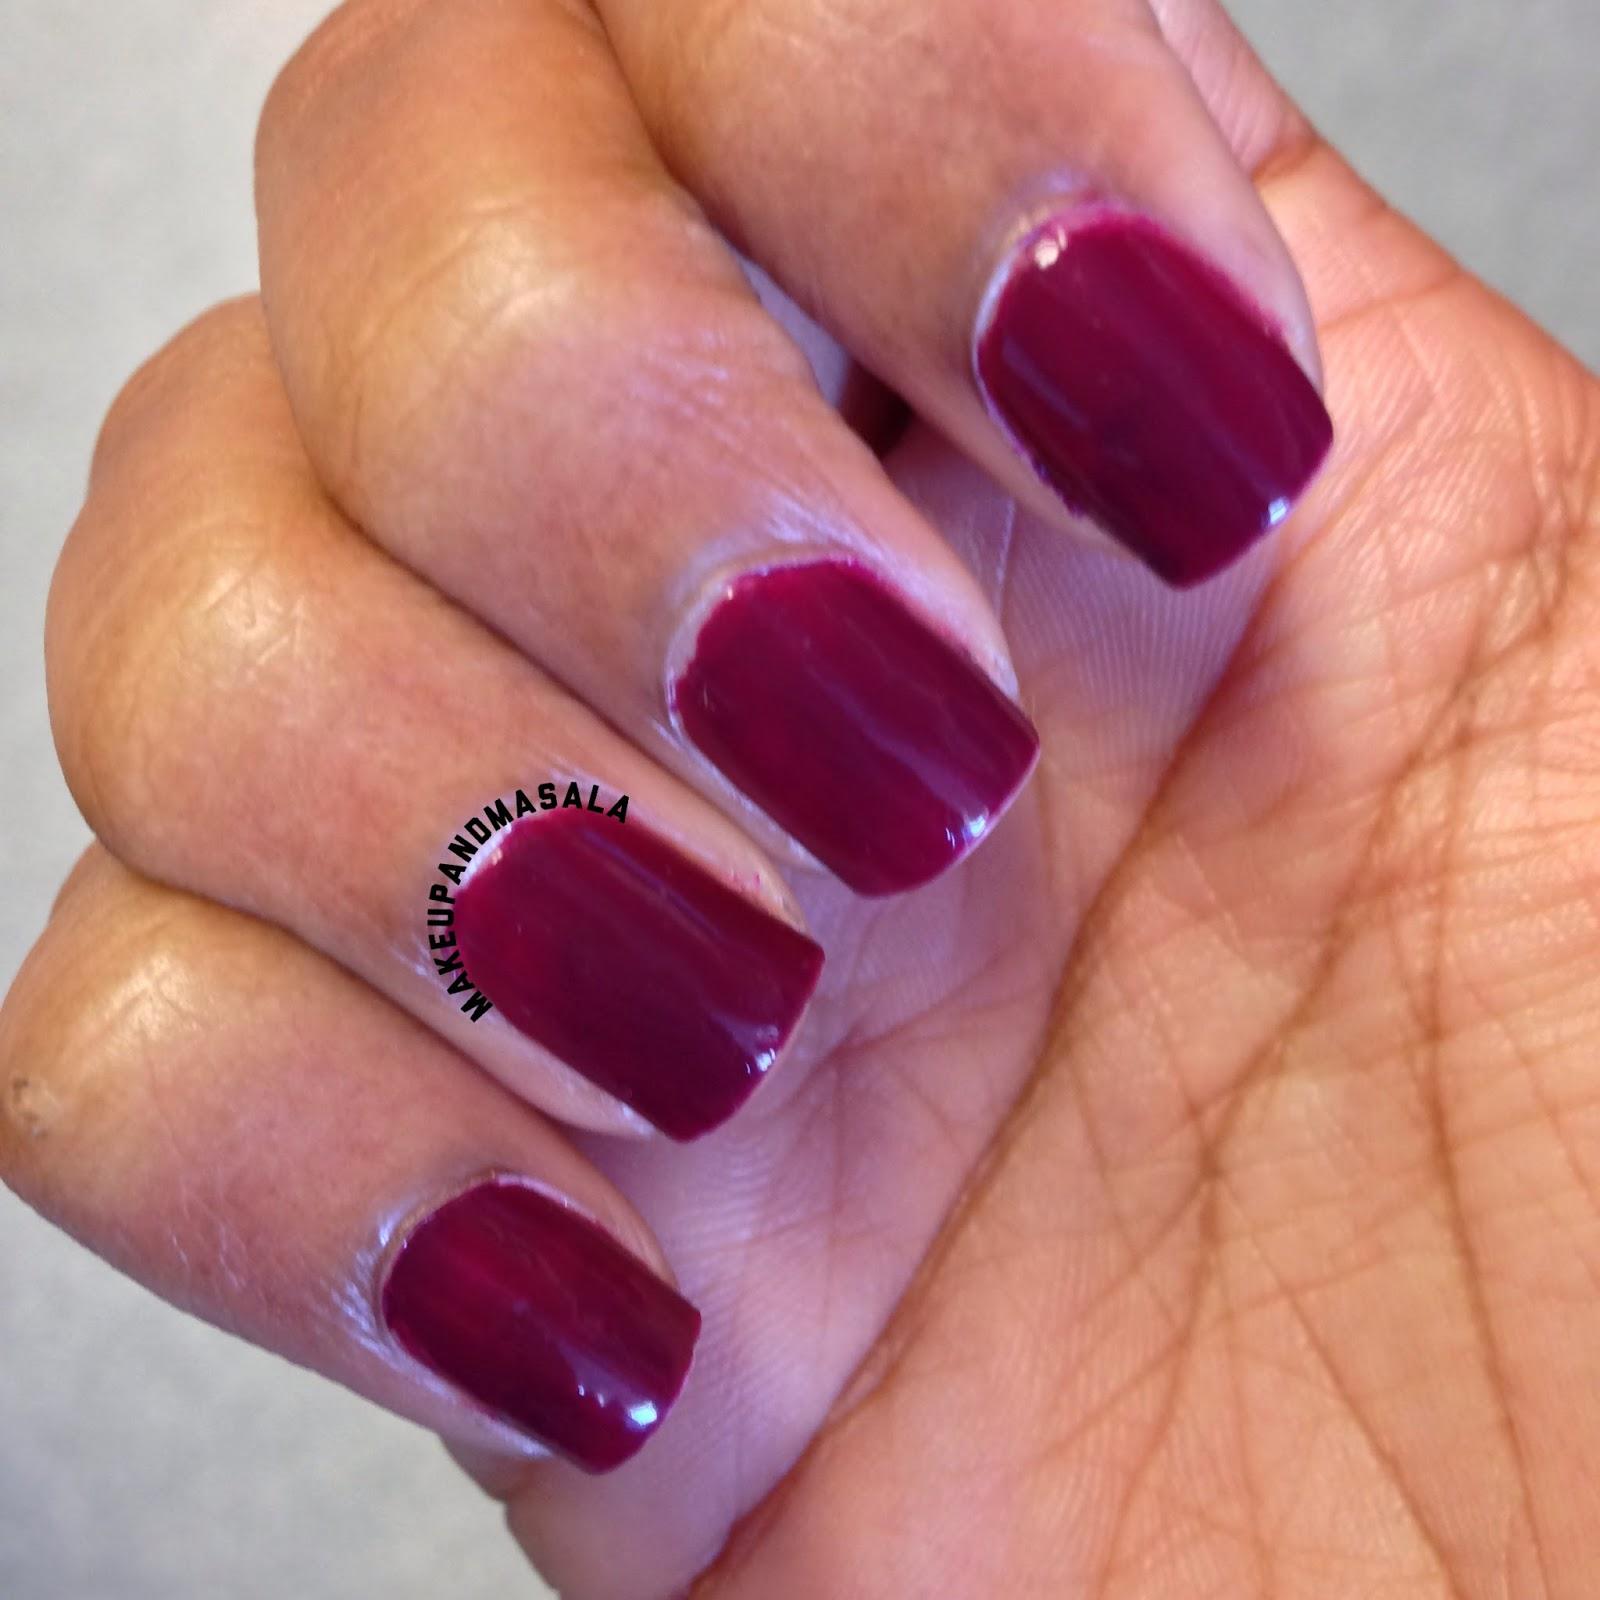 Fall 2015 Nail Trends: Makeup And Masala: The September Issue: Fall 2015 Nail